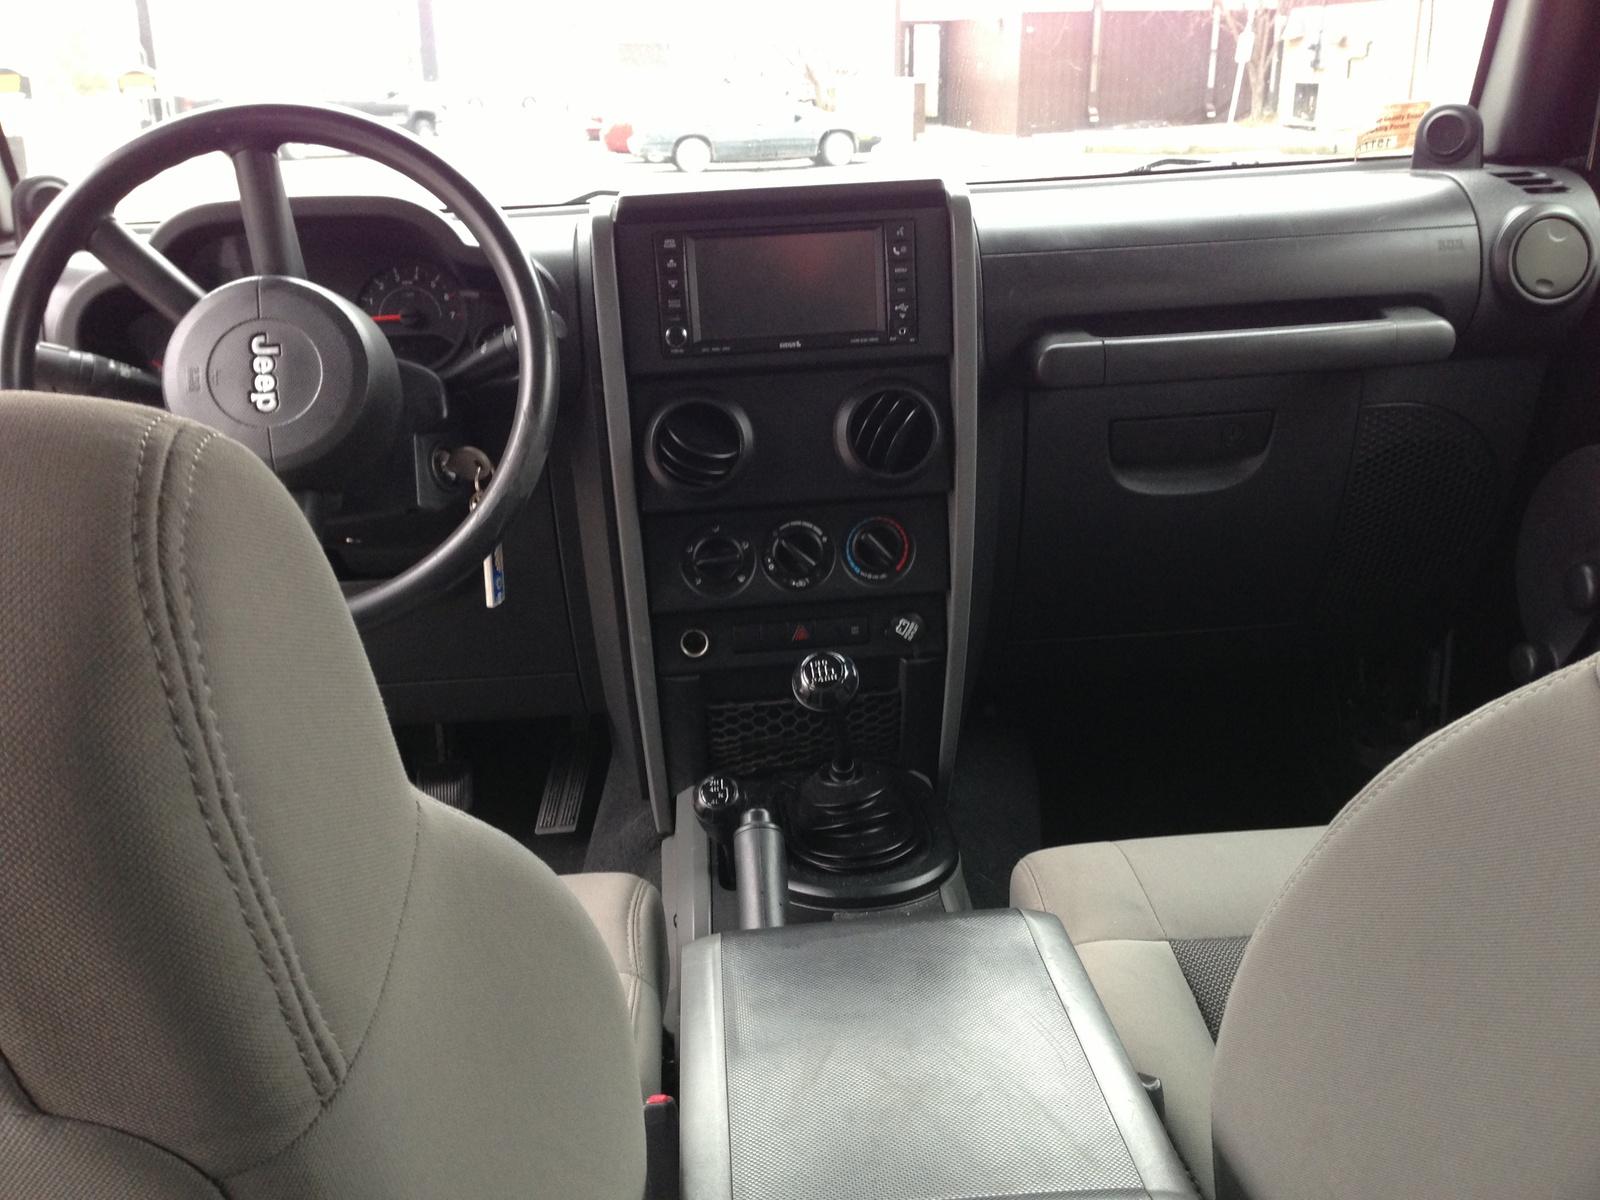 2009 jeep wrangler unlimited interior car interior design